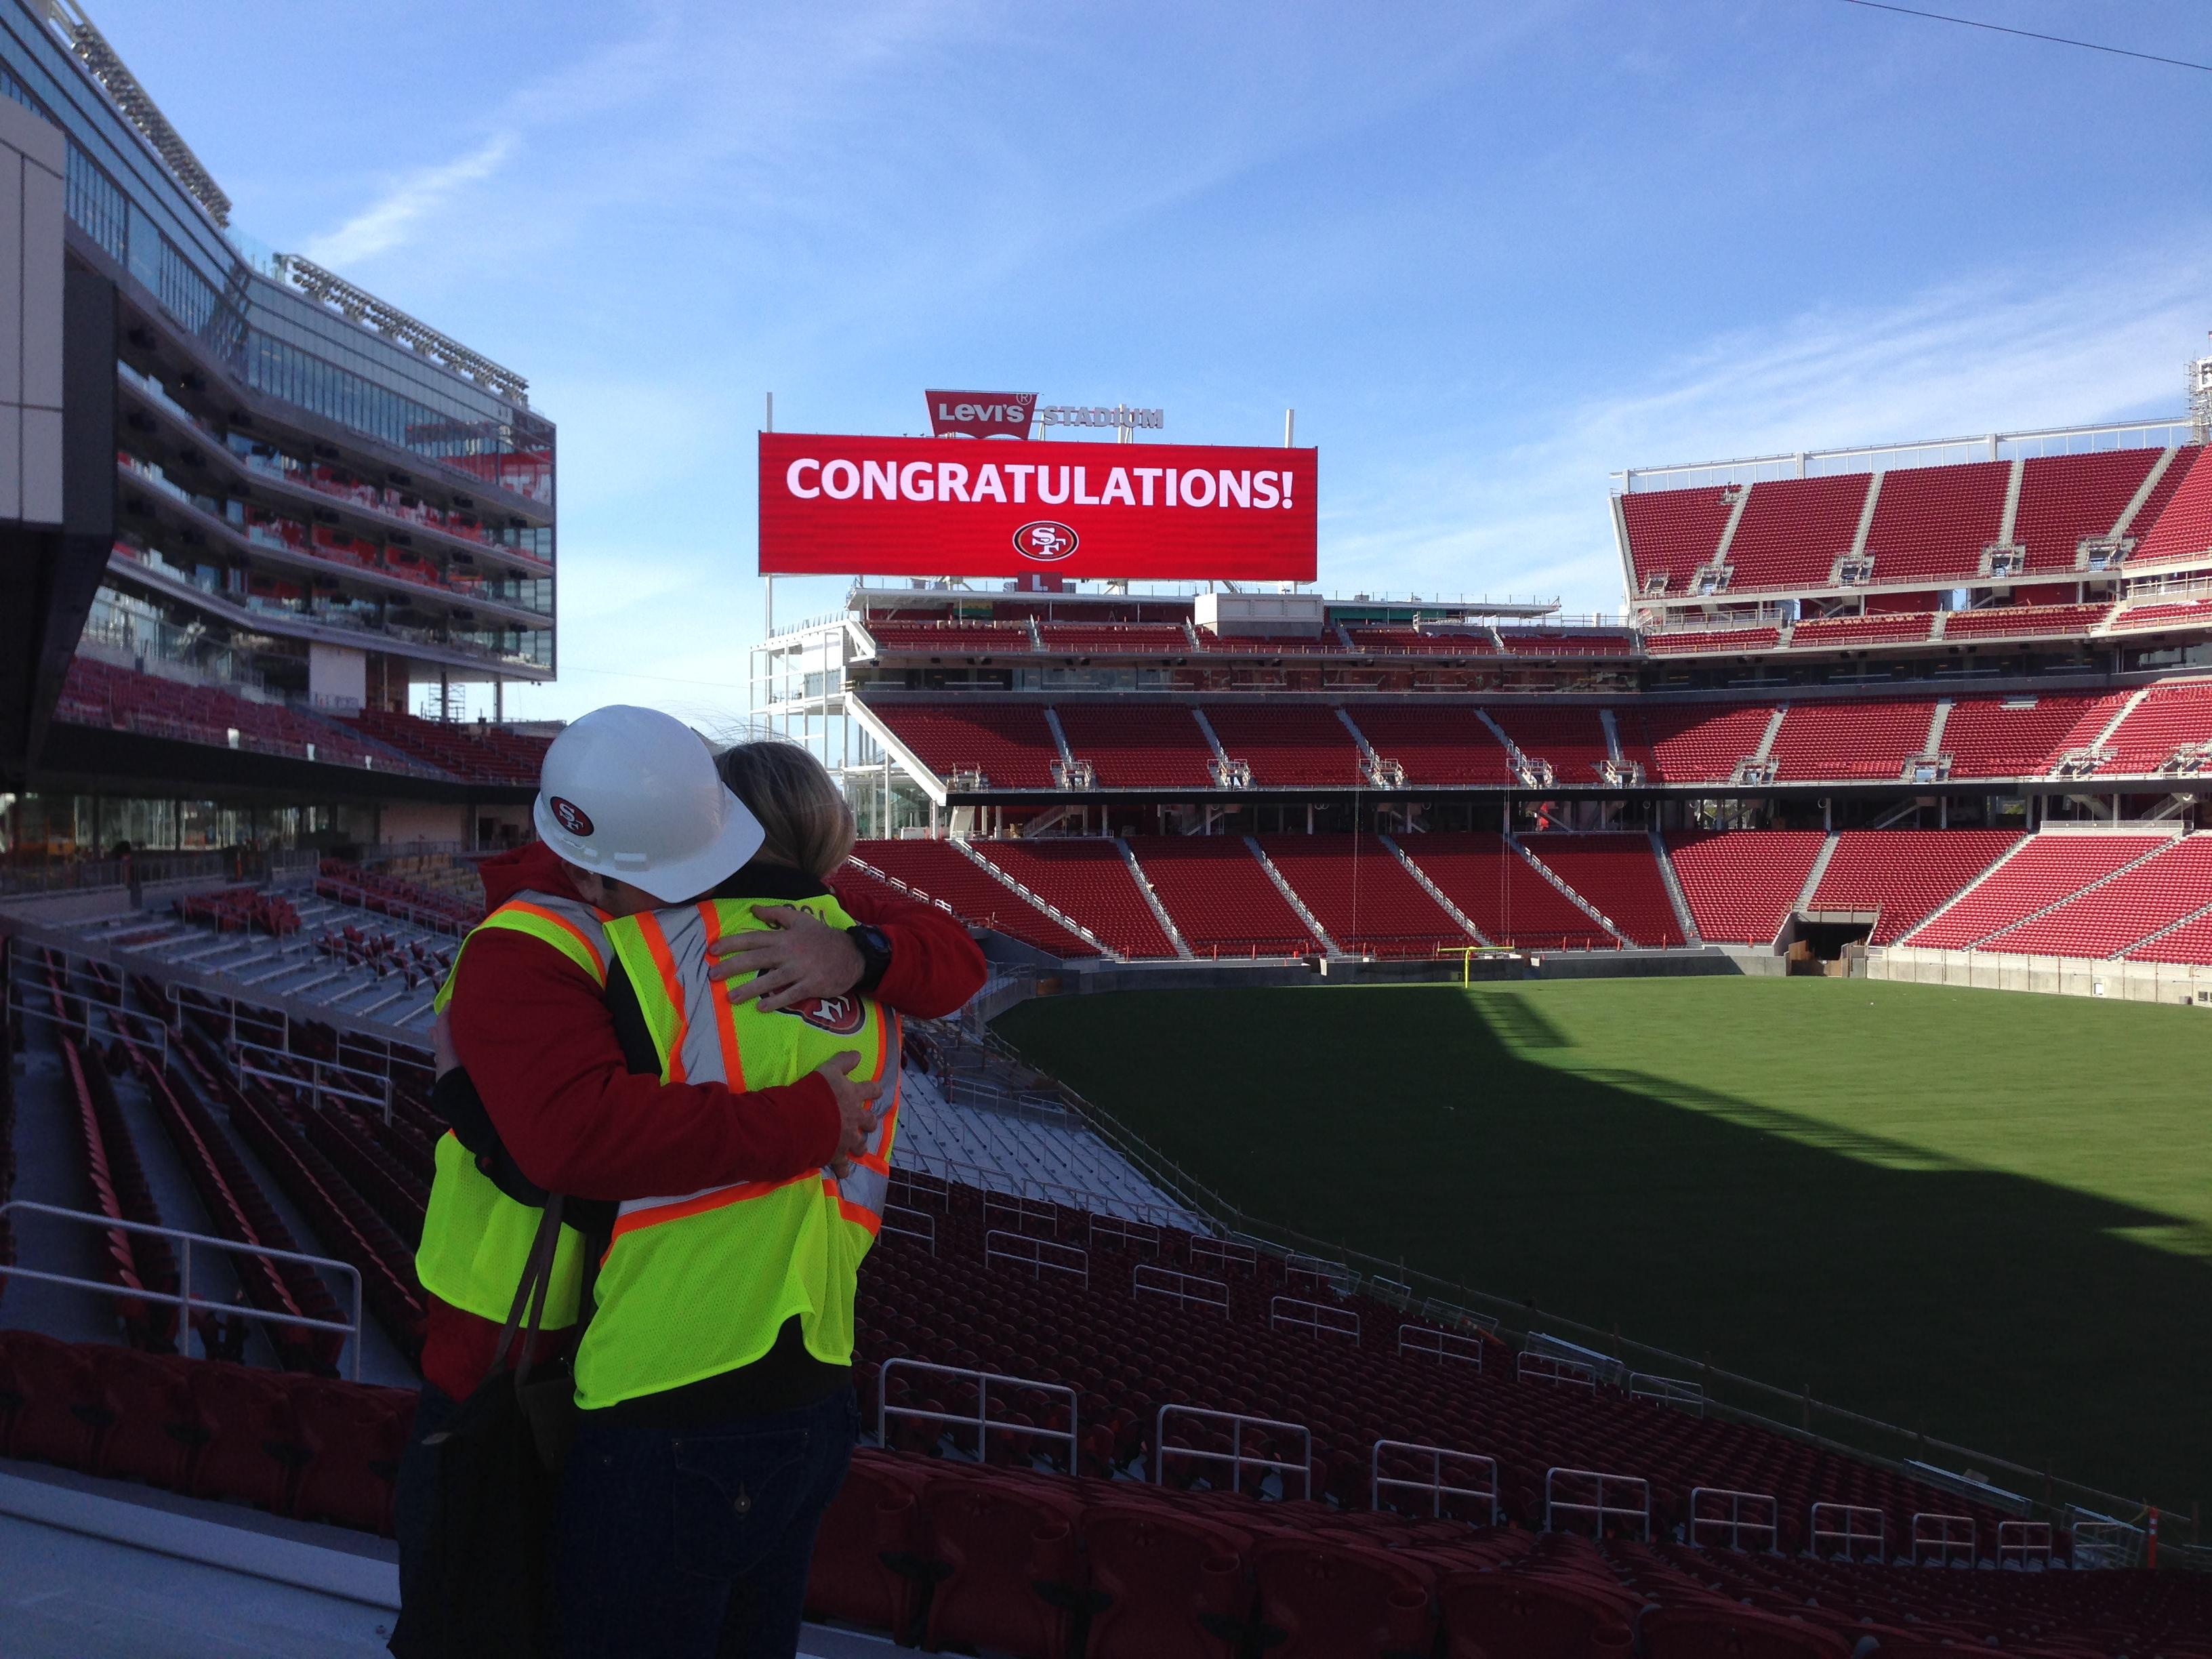 Image 7 of Scott & Sarah: 49ers Fan Proposes in New Stadium